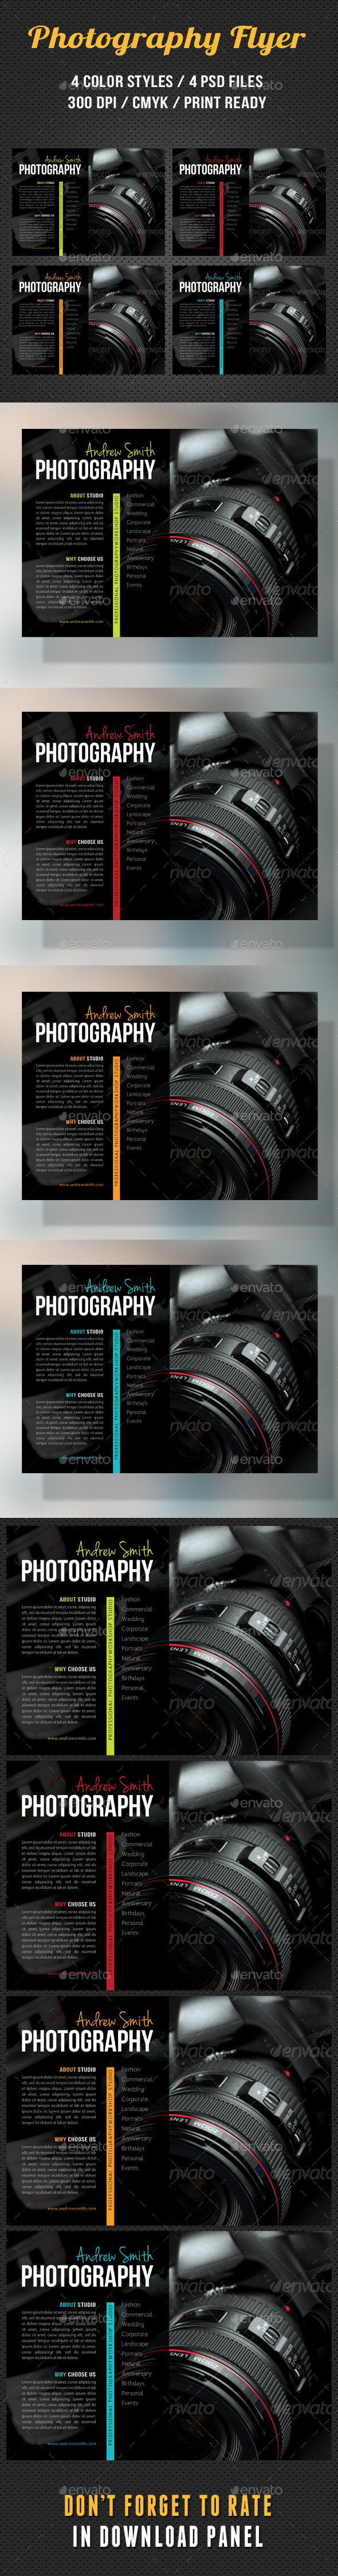 GraphicRiver Photography Studio Flyer 12 9818730